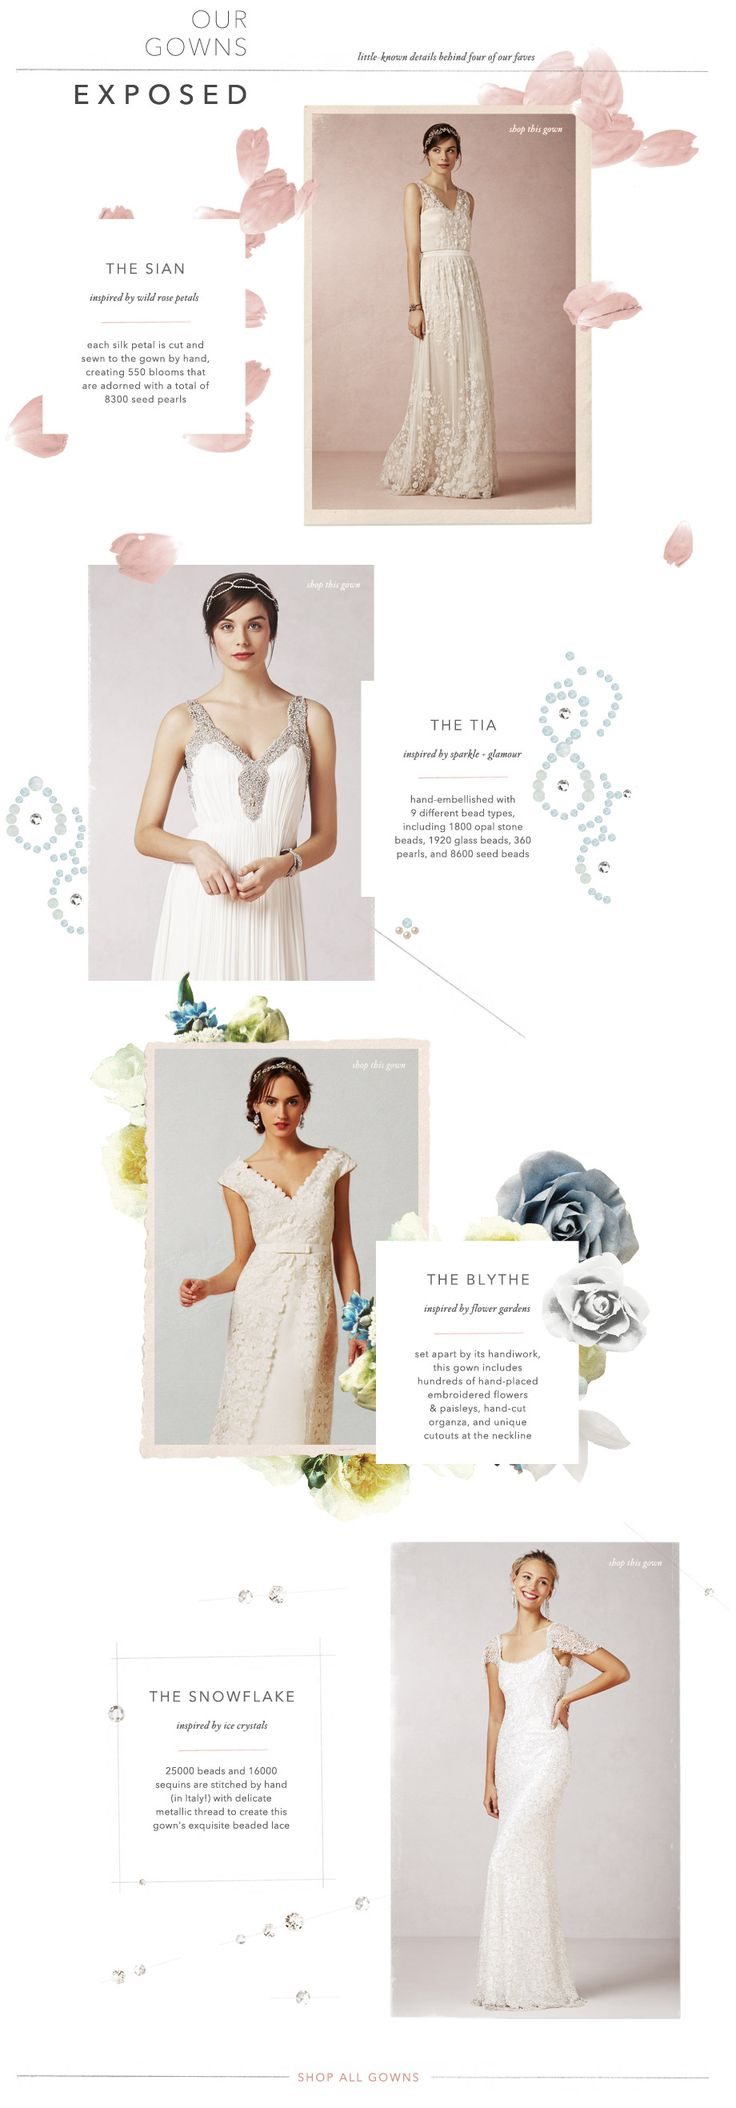 Anthropologie's Vintage Inspired Wedding Dresses & Décor | BHLDN  VERY AFFORDABLE!